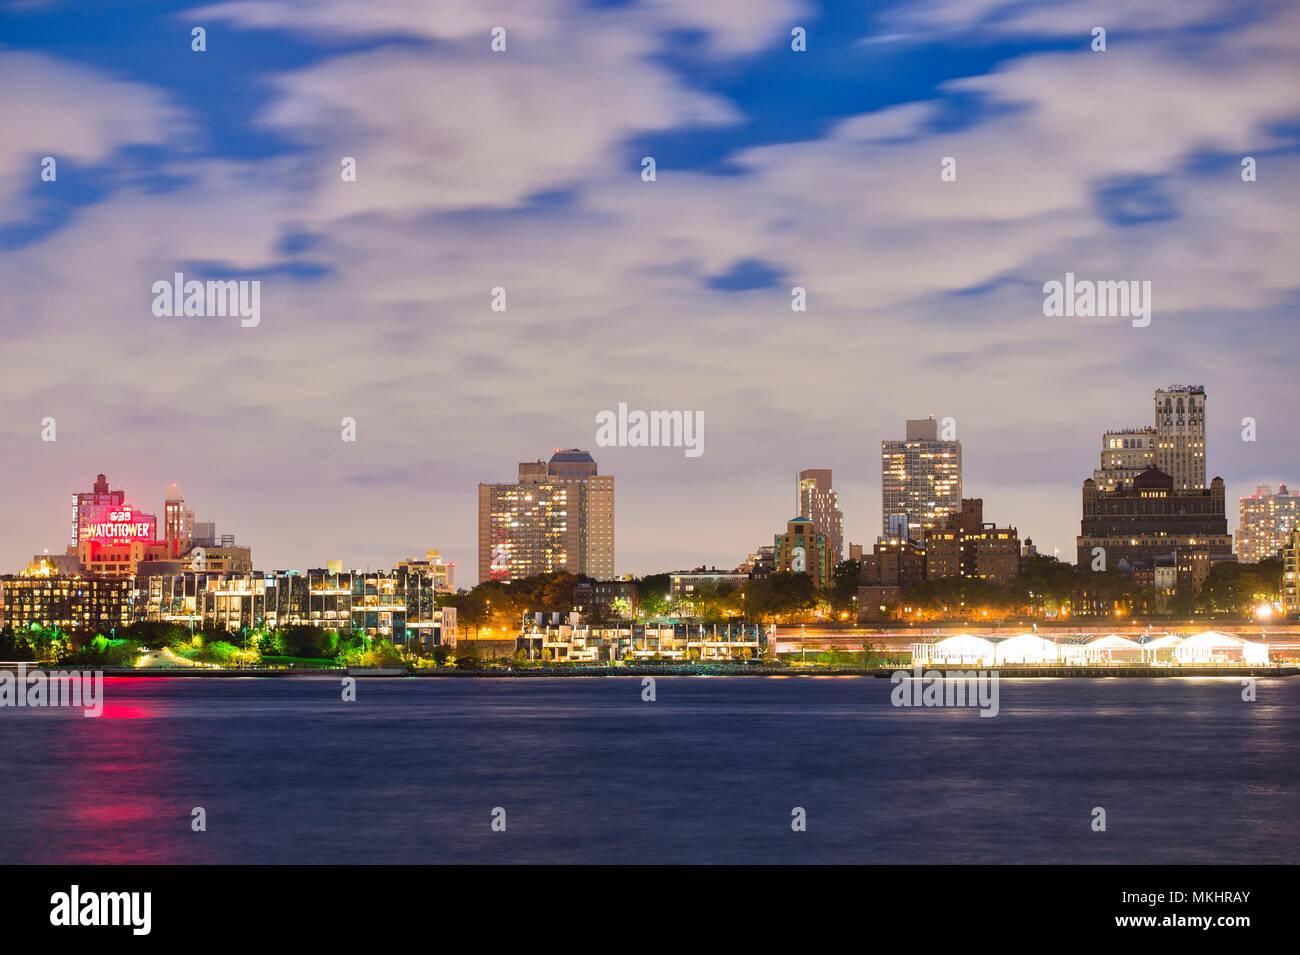 NEW YORK - USA - 29 OCTOBER 2017. View of Manhattan skyline illuminated at dusk over the Hudson River. New York City, USA. - Stock Image